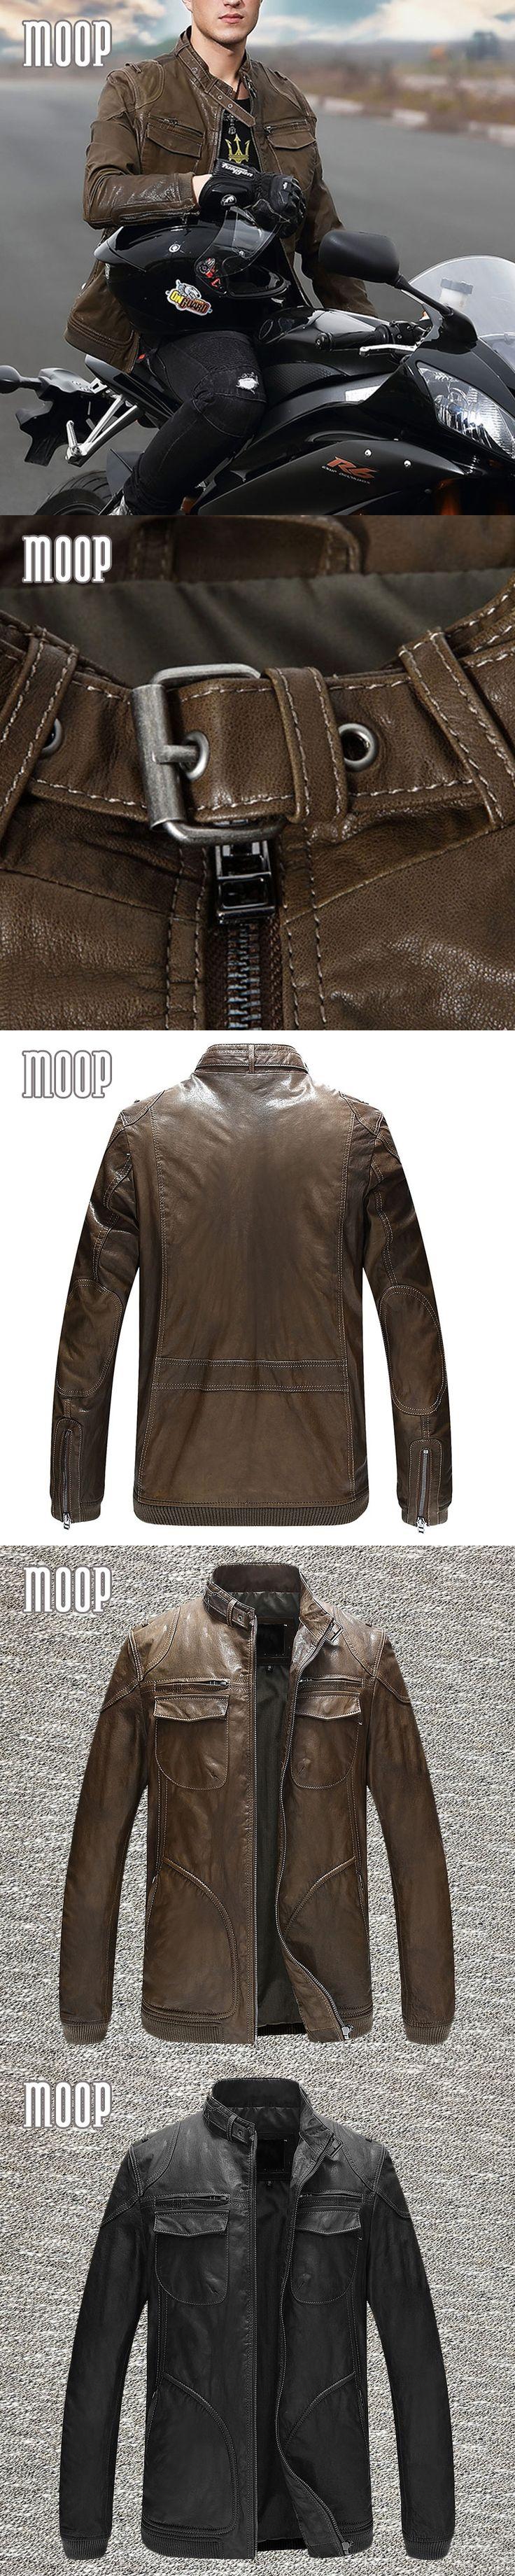 Genuine leather jacket men sheepskin rock coats motorcycle jacket chaqueta moto hombre veste cuir homme cappotto free ship LT049